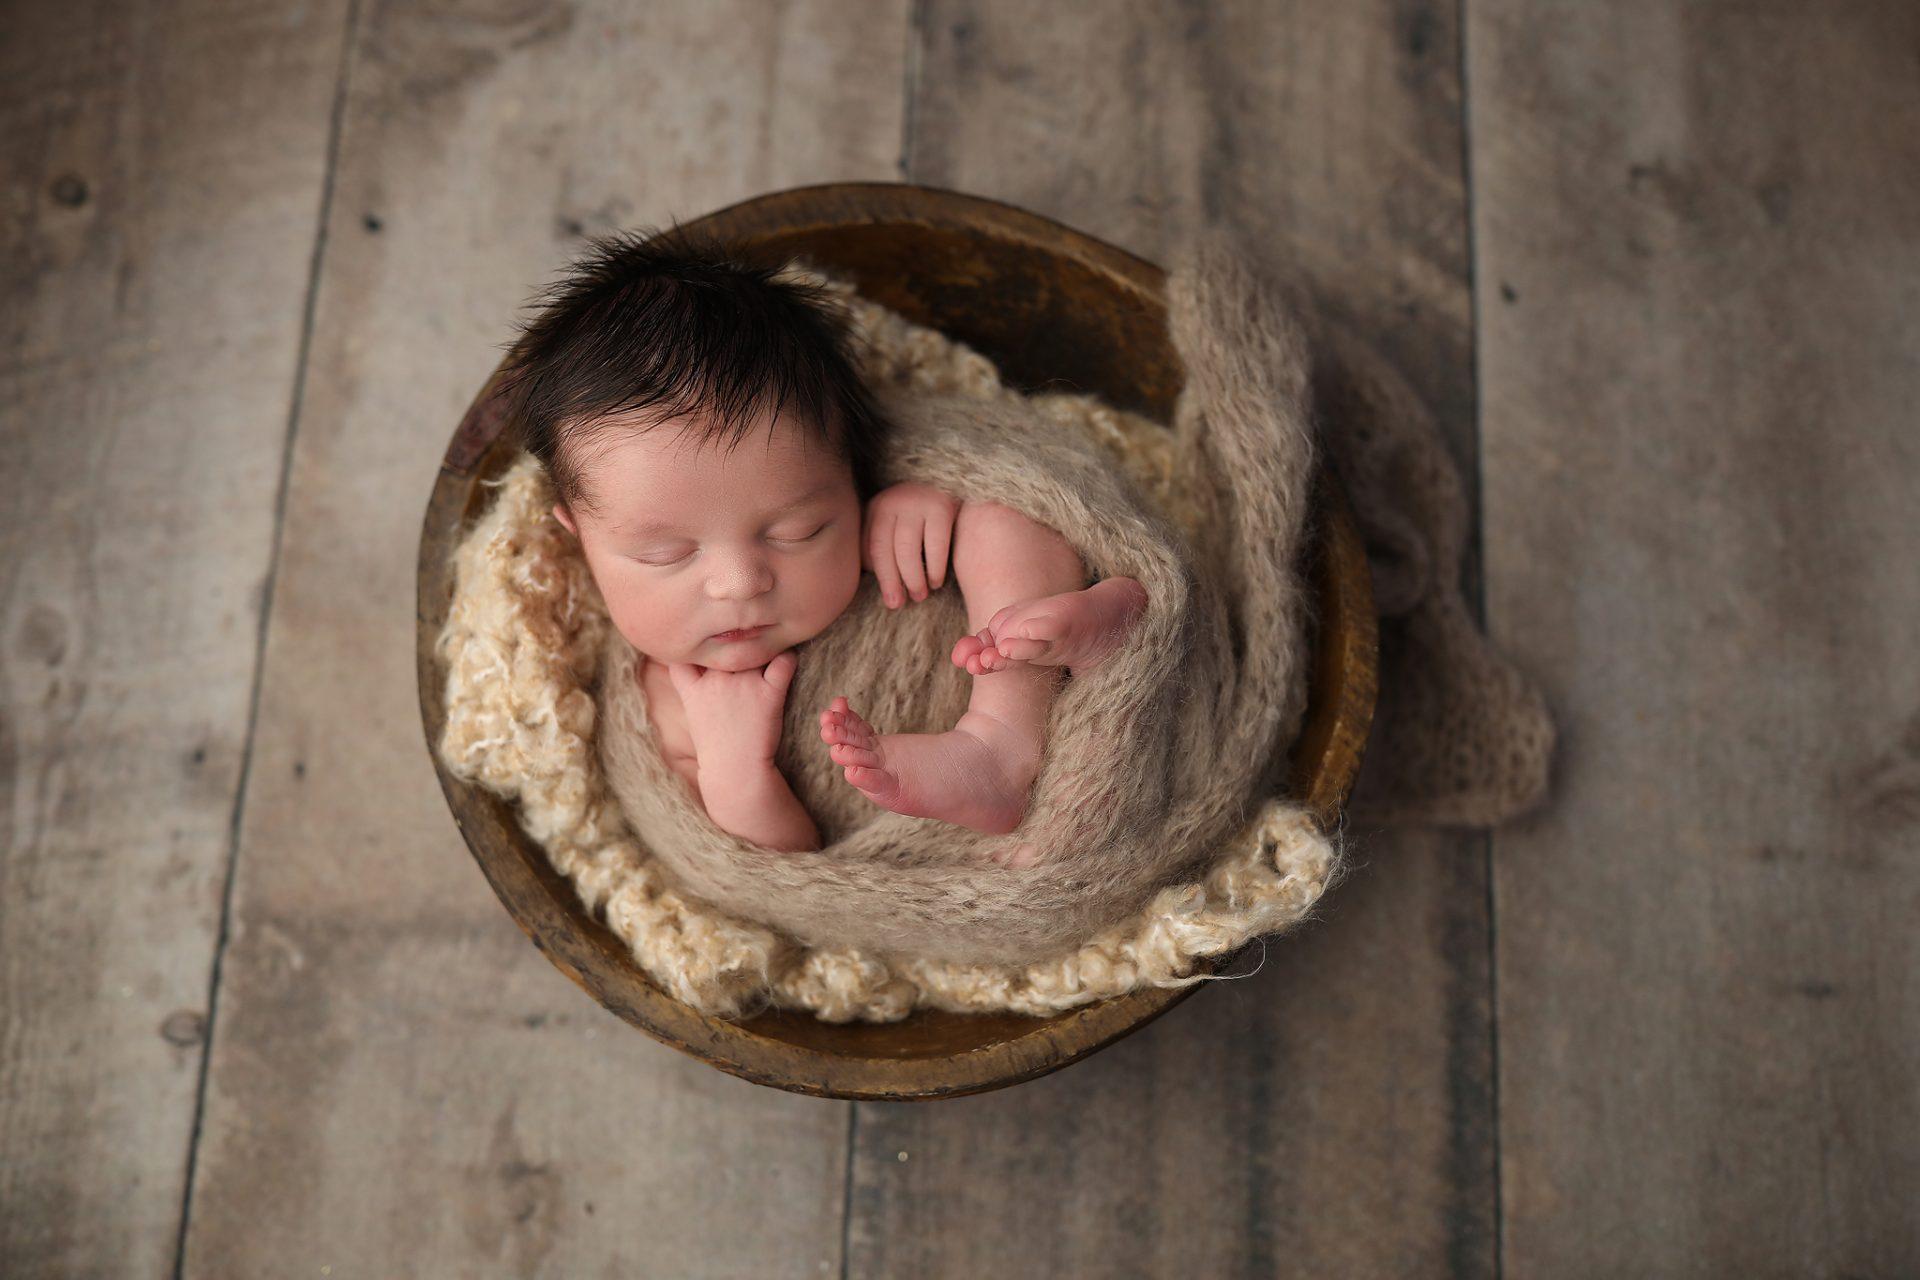 Tucson baby poses in bucket